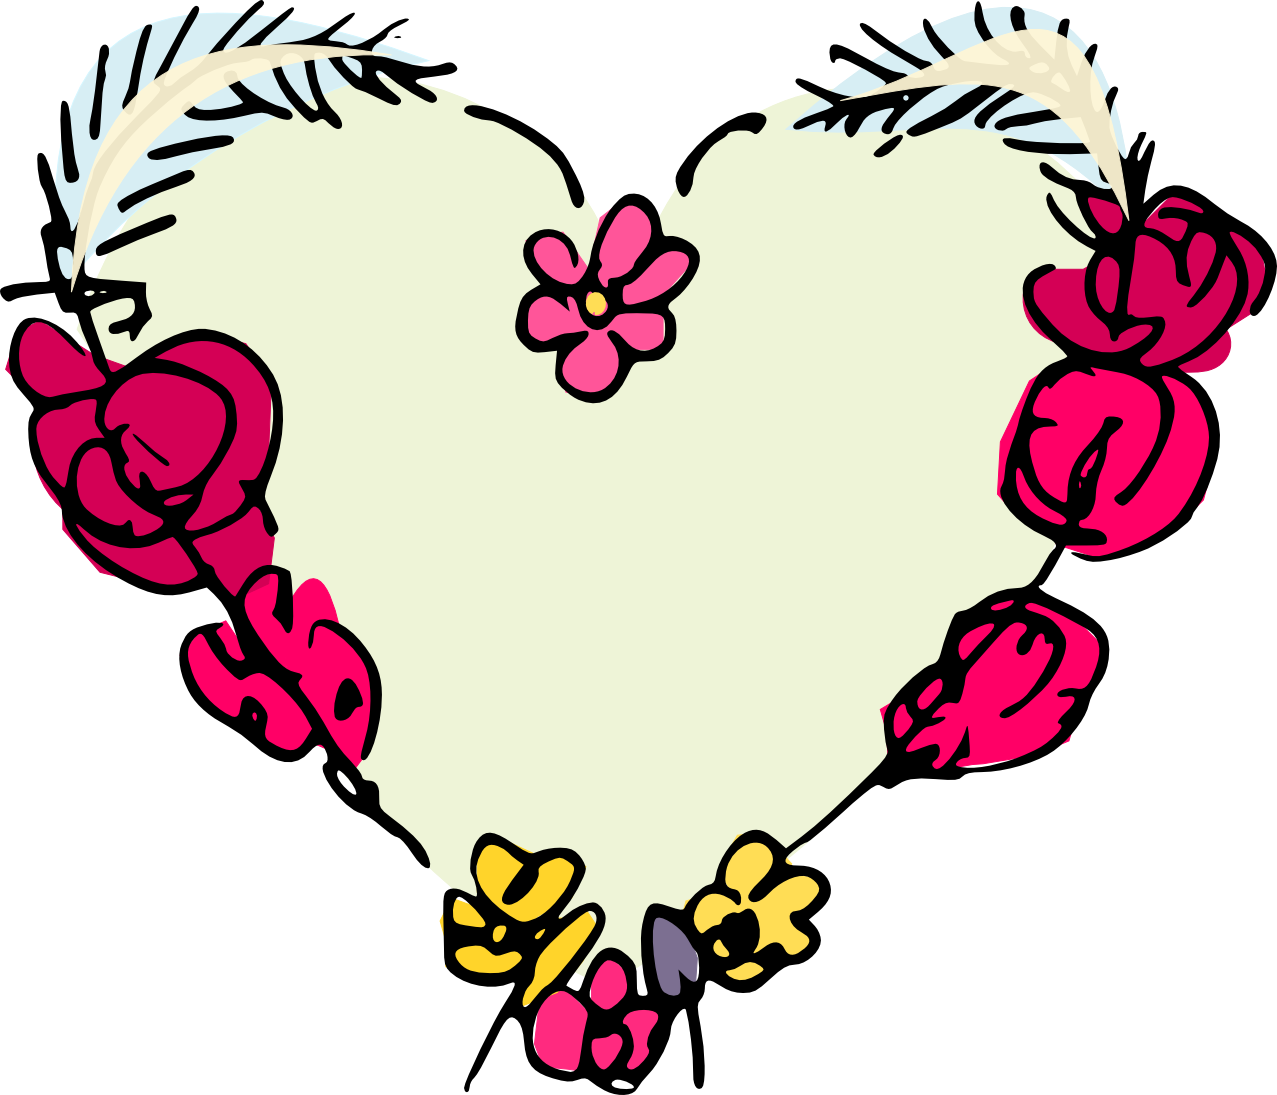 Free digital heart scrapbooking. Hearts clipart scrapbook